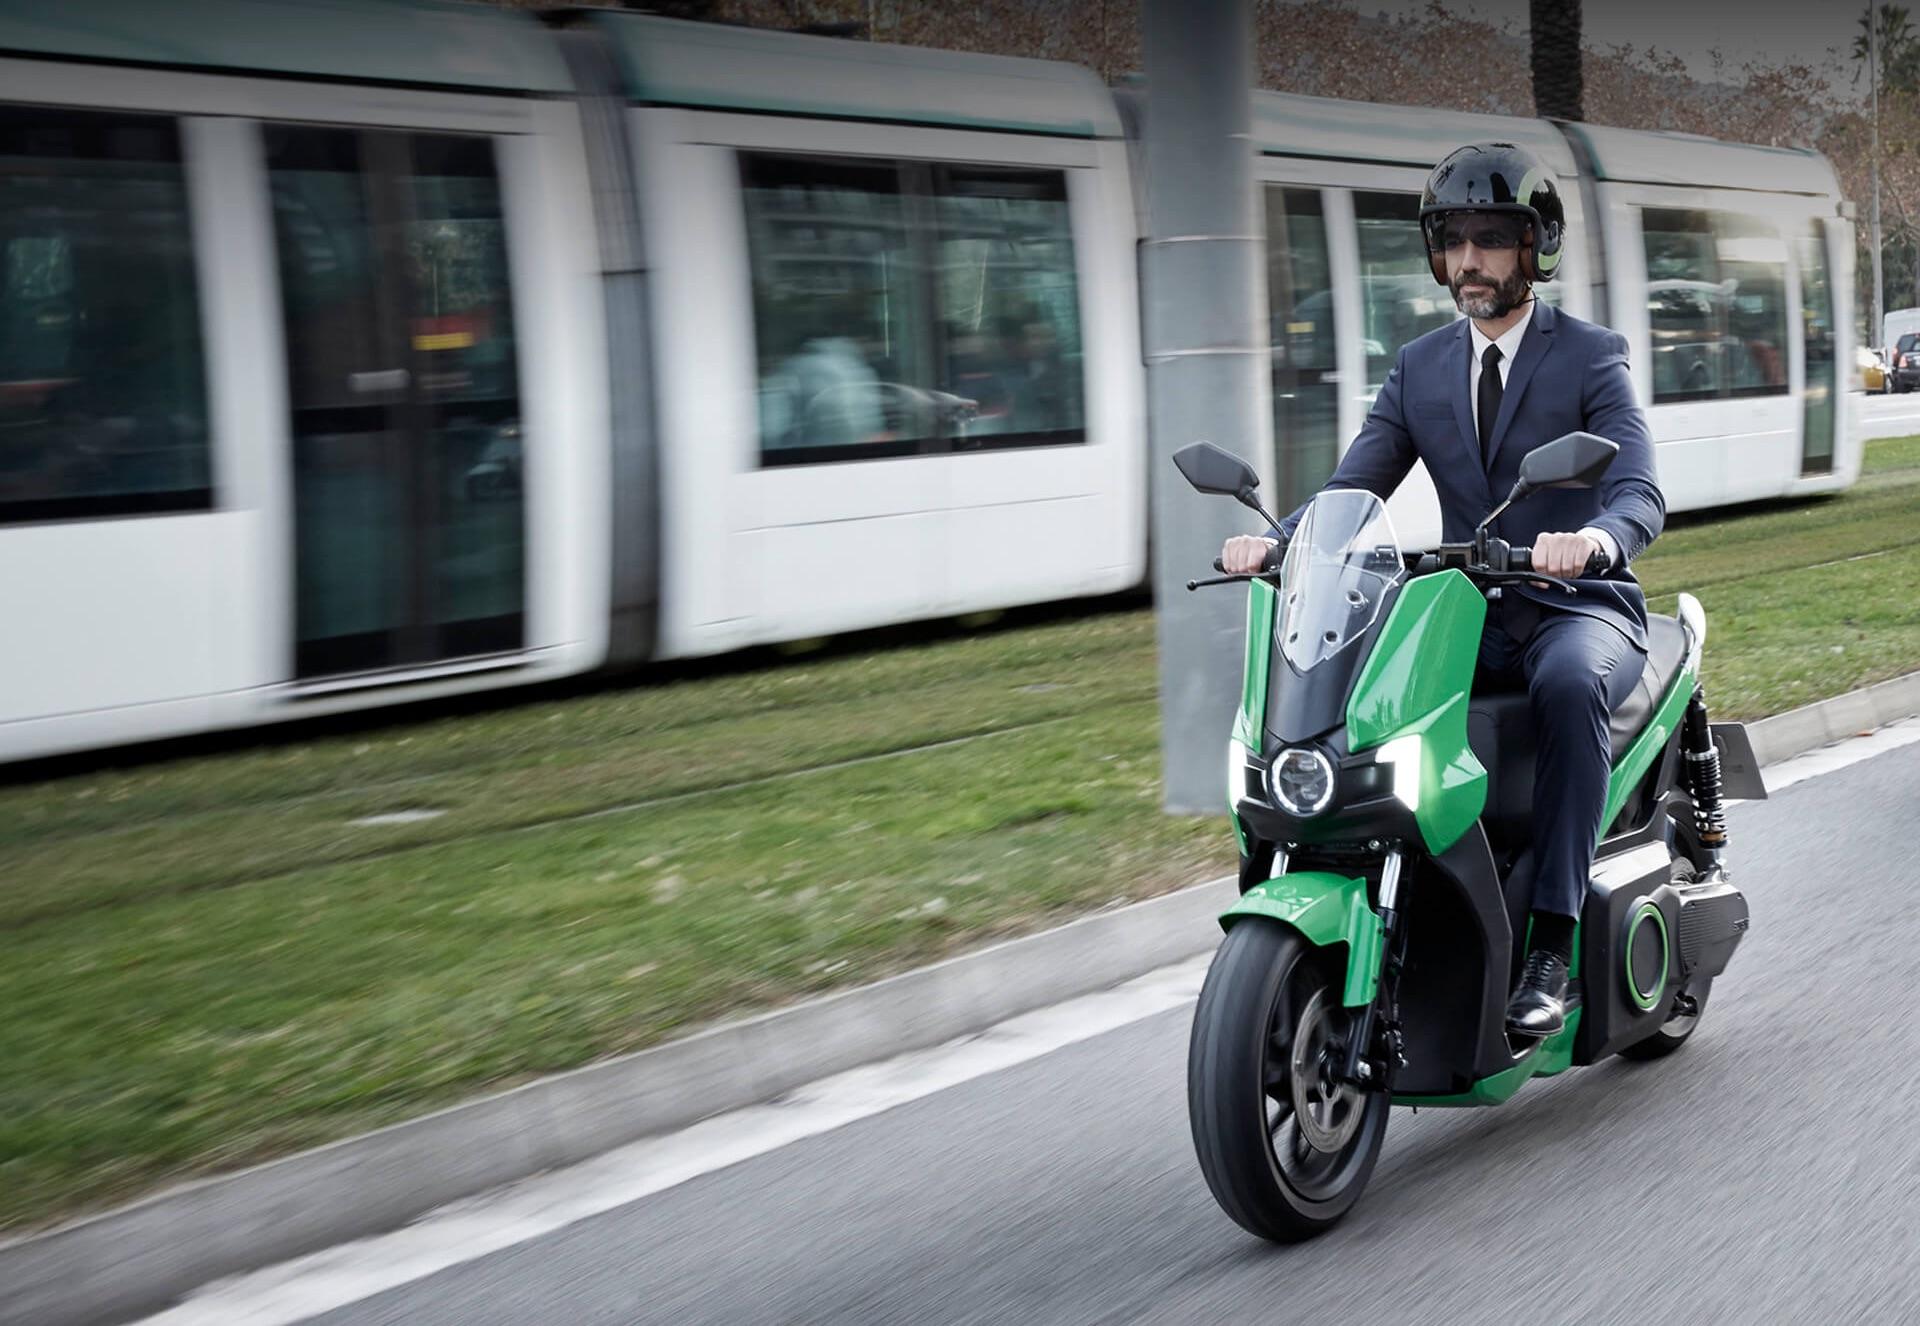 Seat comenzará a vender motos